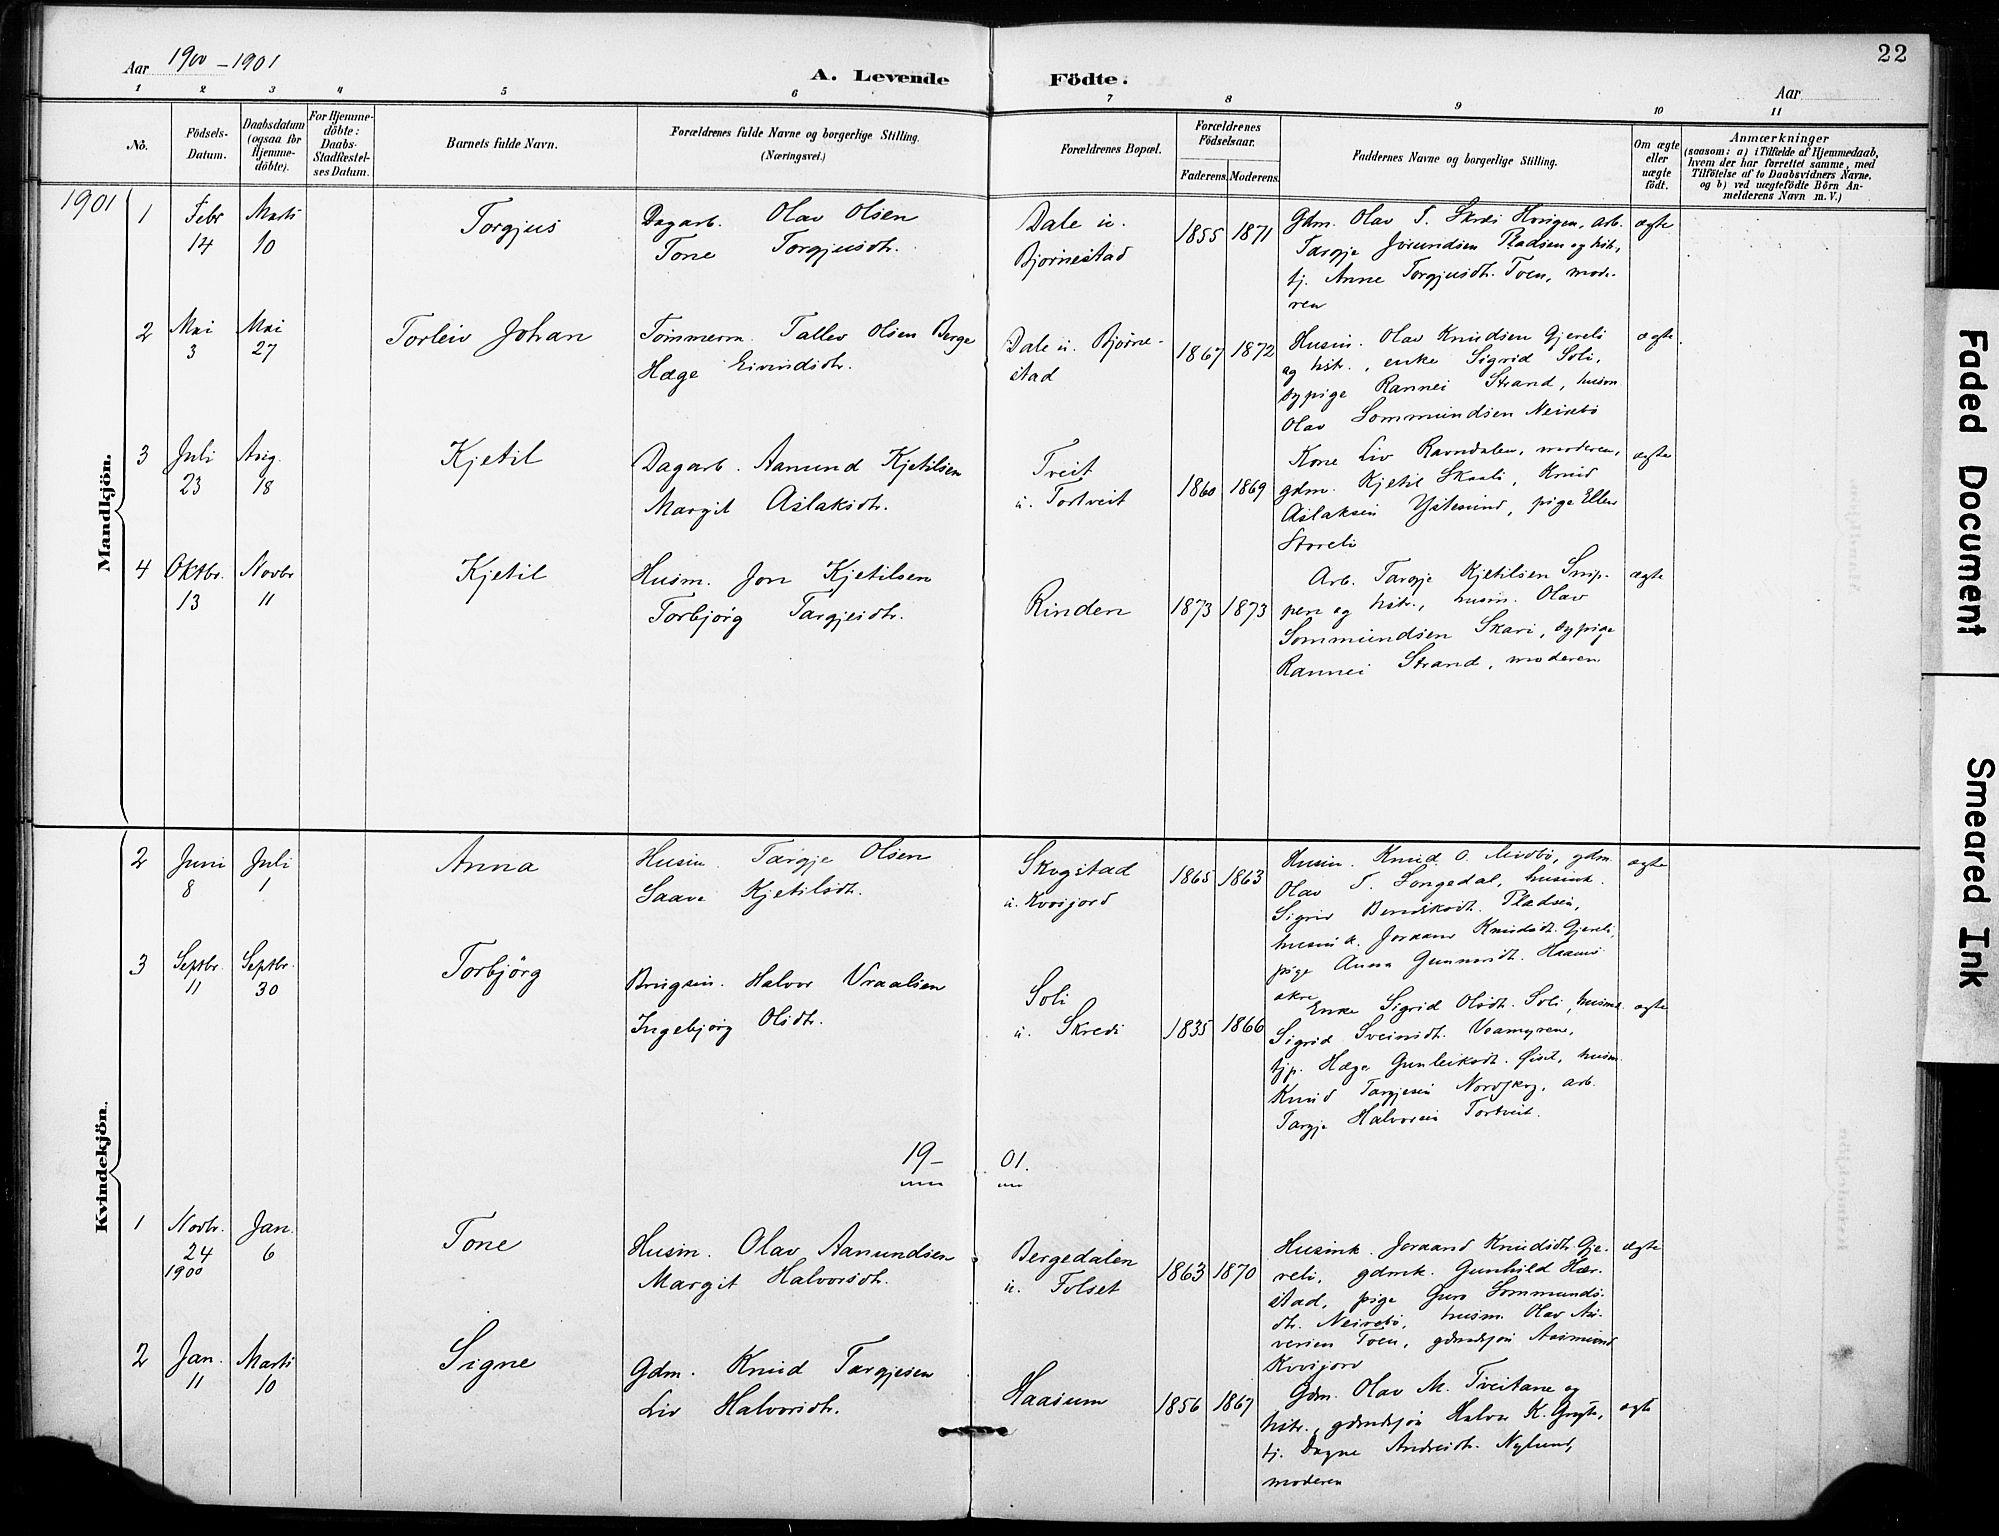 SAKO, Fyresdal kirkebøker, F/Fb/L0003: Ministerialbok nr. II 3, 1887-1903, s. 22